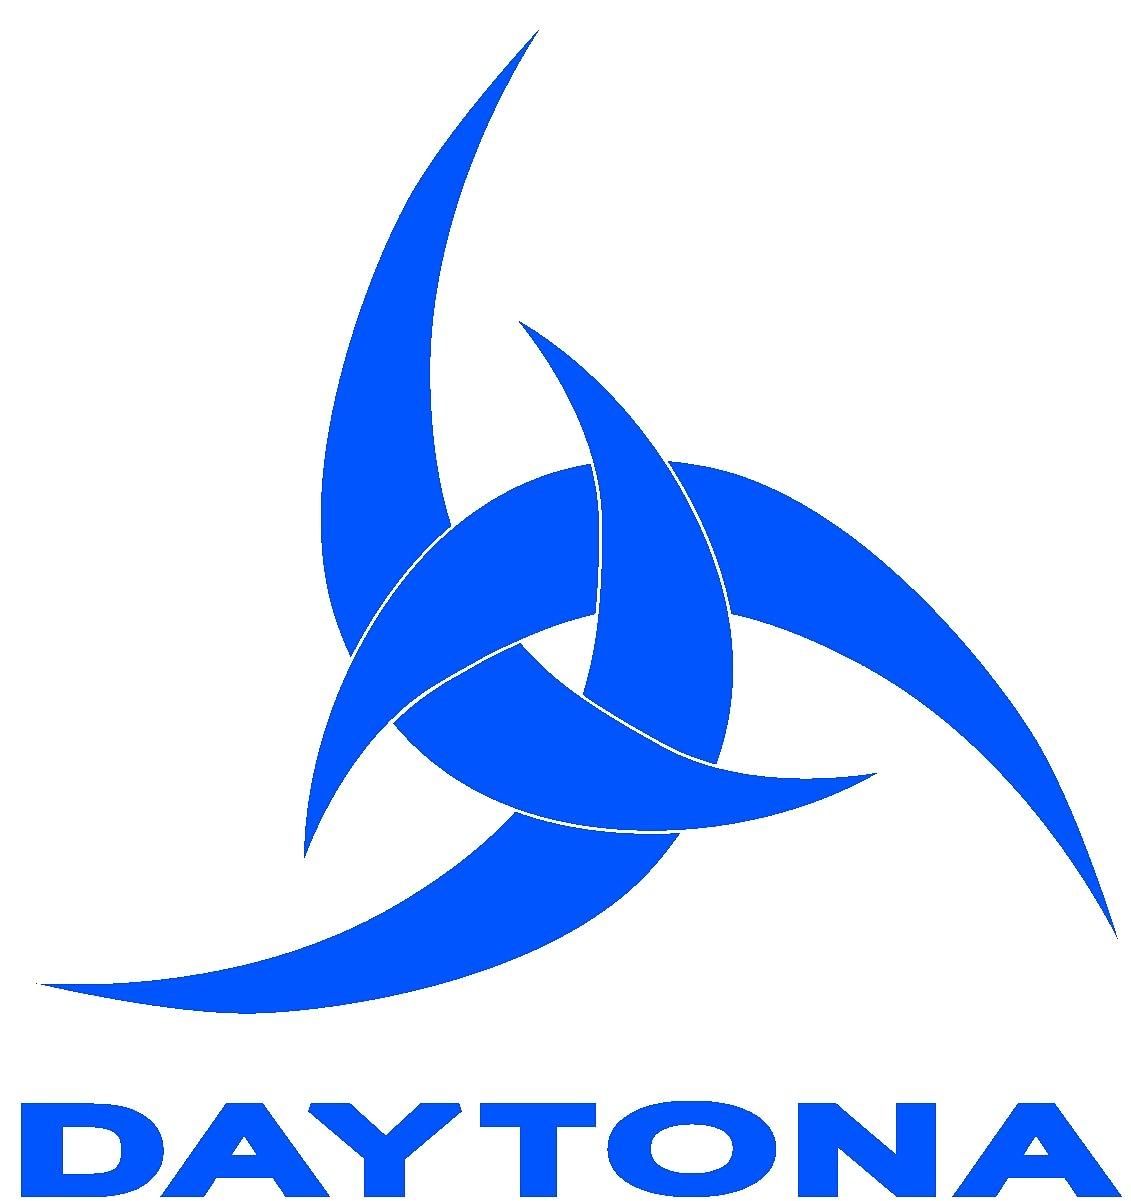 Daytona Gesundheitszentrum GmbH